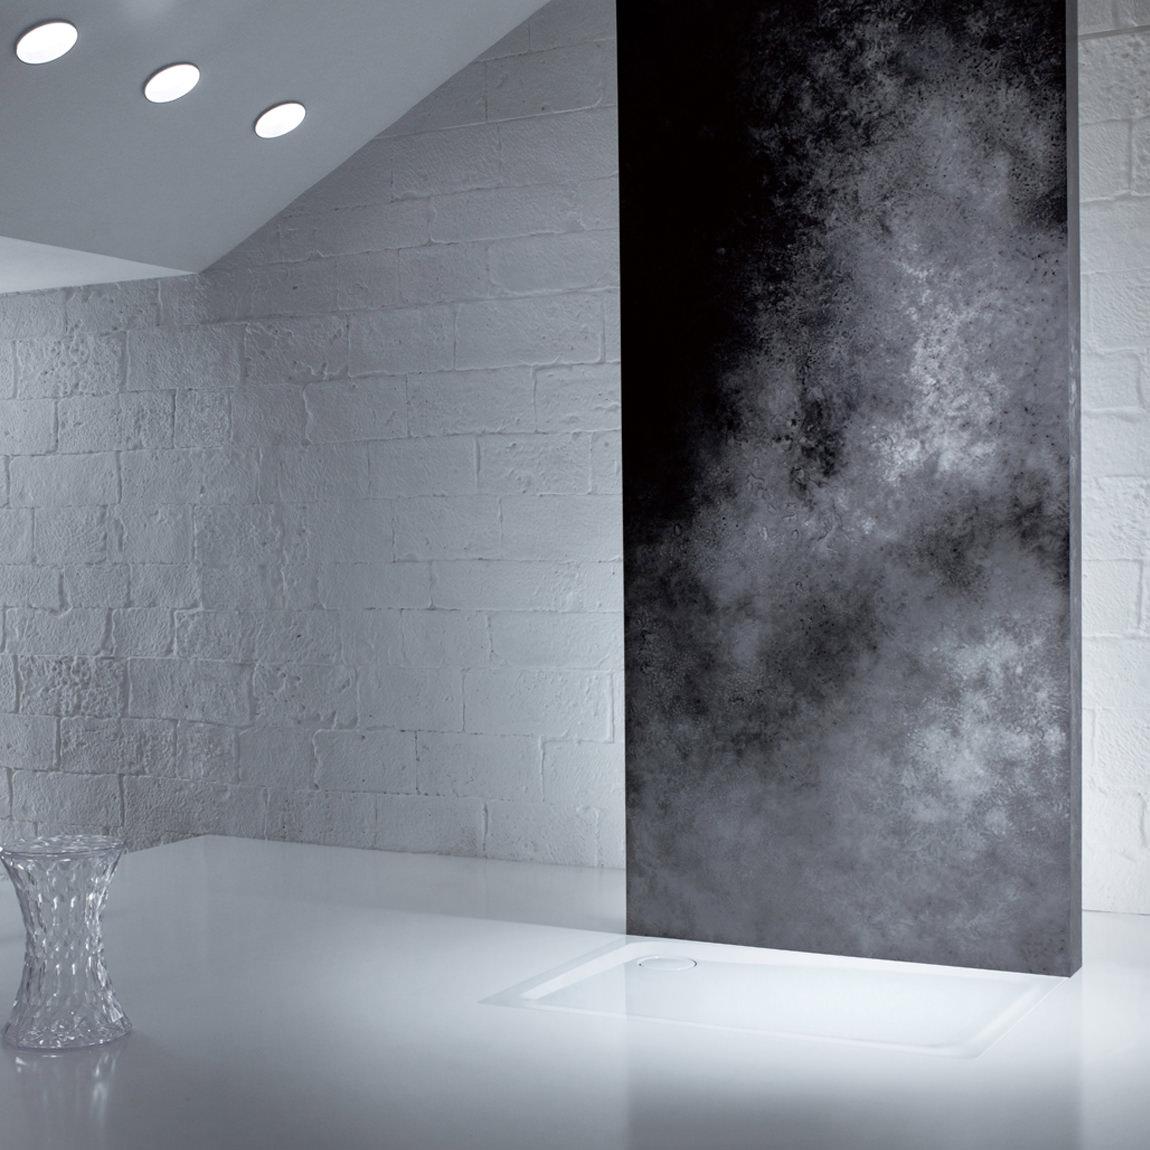 kaldewei avantgarde superplan plus 1000 x 900mm steel shower tray. Black Bedroom Furniture Sets. Home Design Ideas